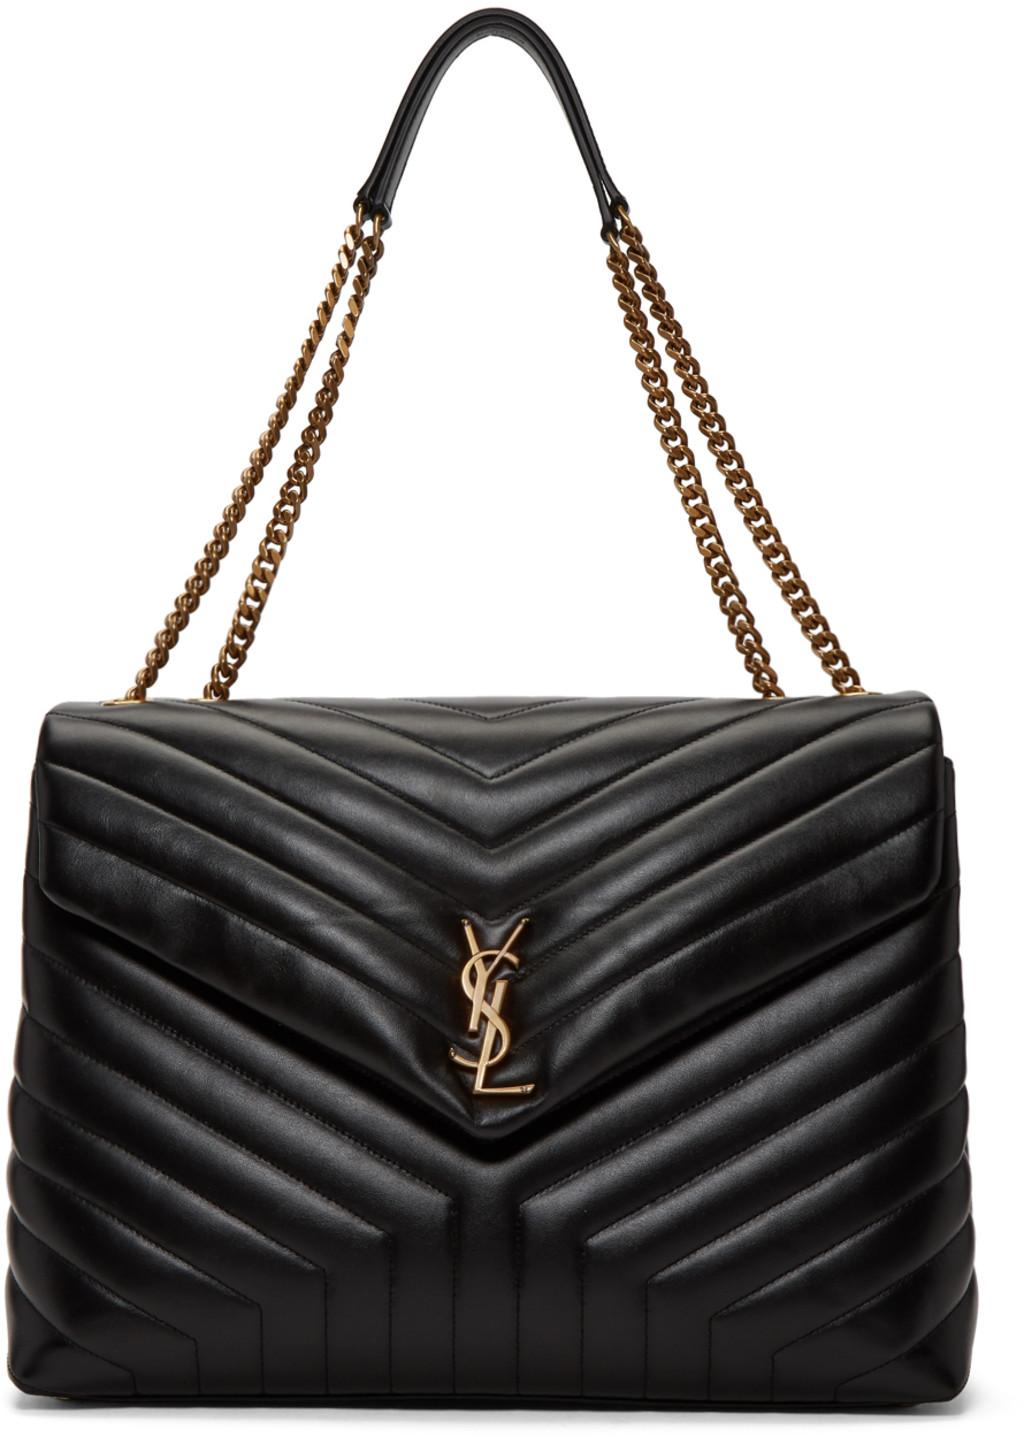 Saint Laurent Debutes Blogger Bag', One of Its Most Affordable Handbags recommendations